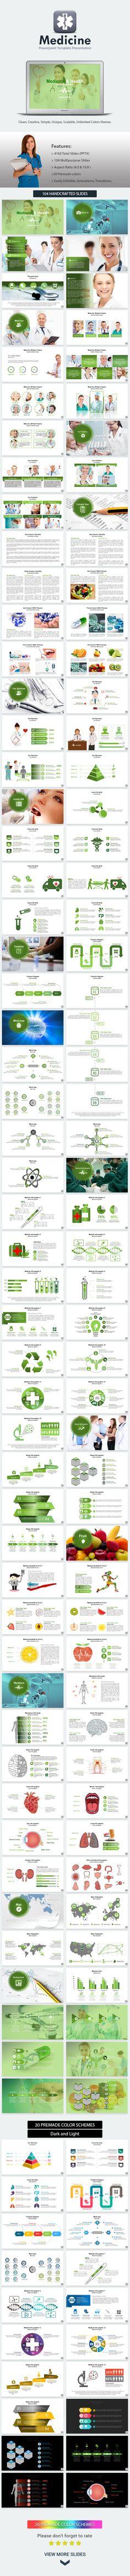 Medicine PowerPoint Presentation Template #design #slides Download: http://graphicriver.net/item/medicine-presentation-template/13593212?ref=ksioks